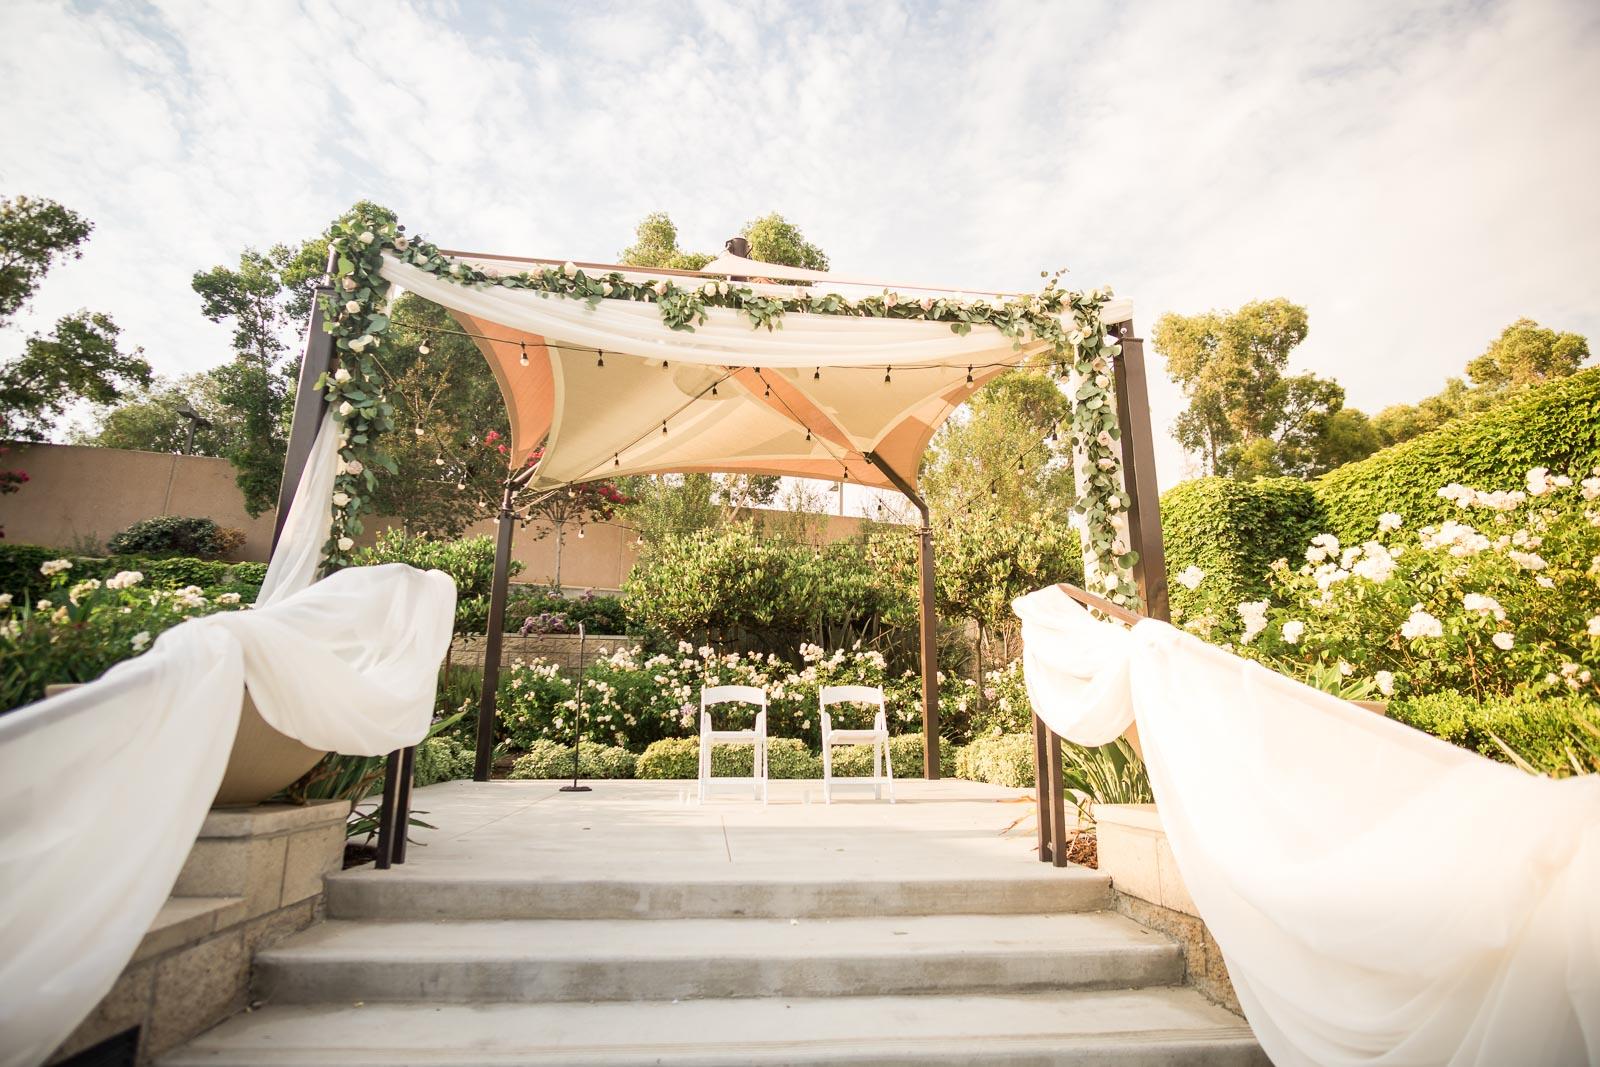 114_Angel-Brea-Orange-County_Joseph-Barber-Wedding-Photography.jpg